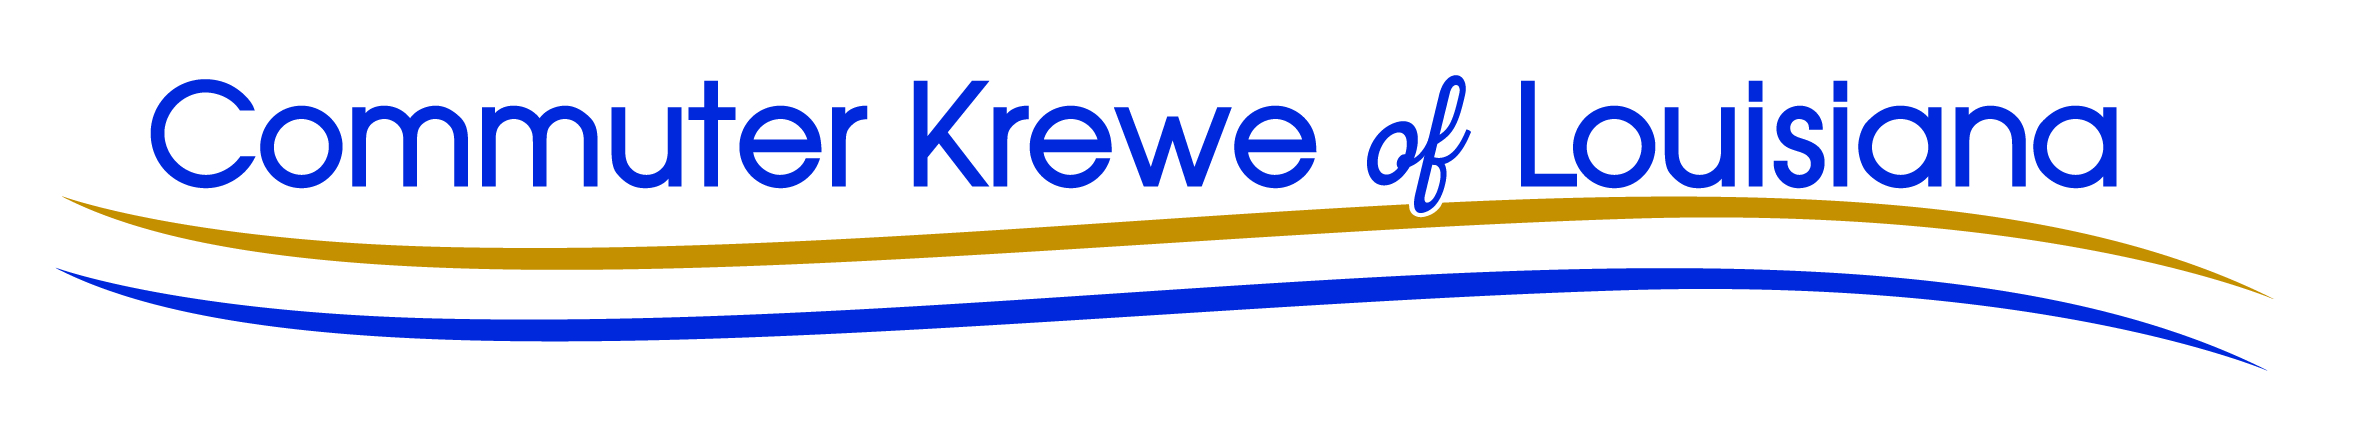 090817-CRPC-CKofLA-Logo-Type.jpg